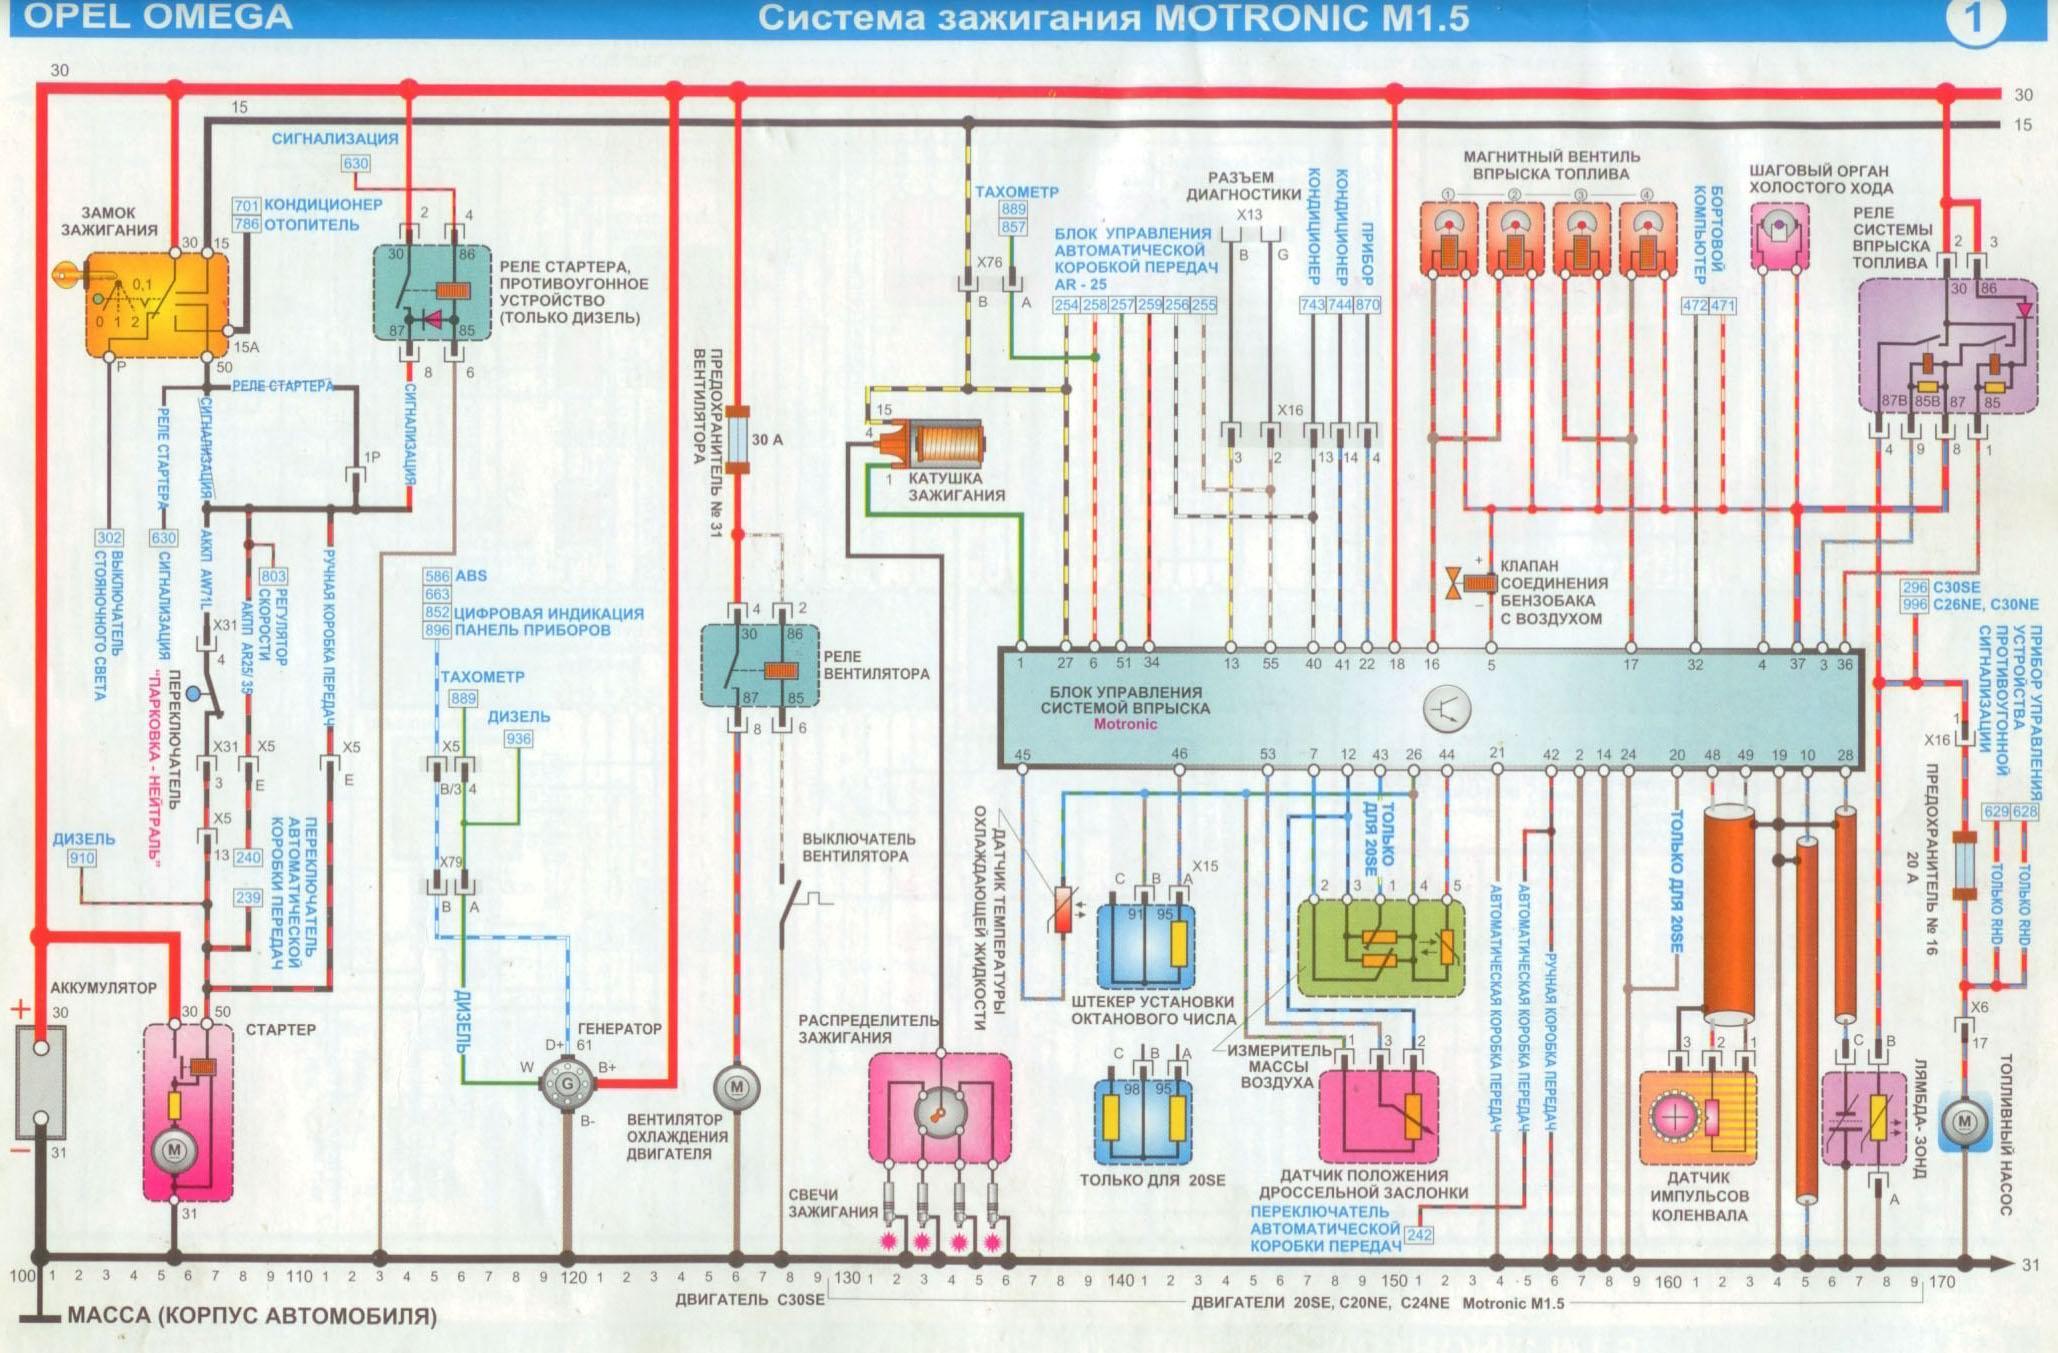 opel omega b схема модуль зажигания